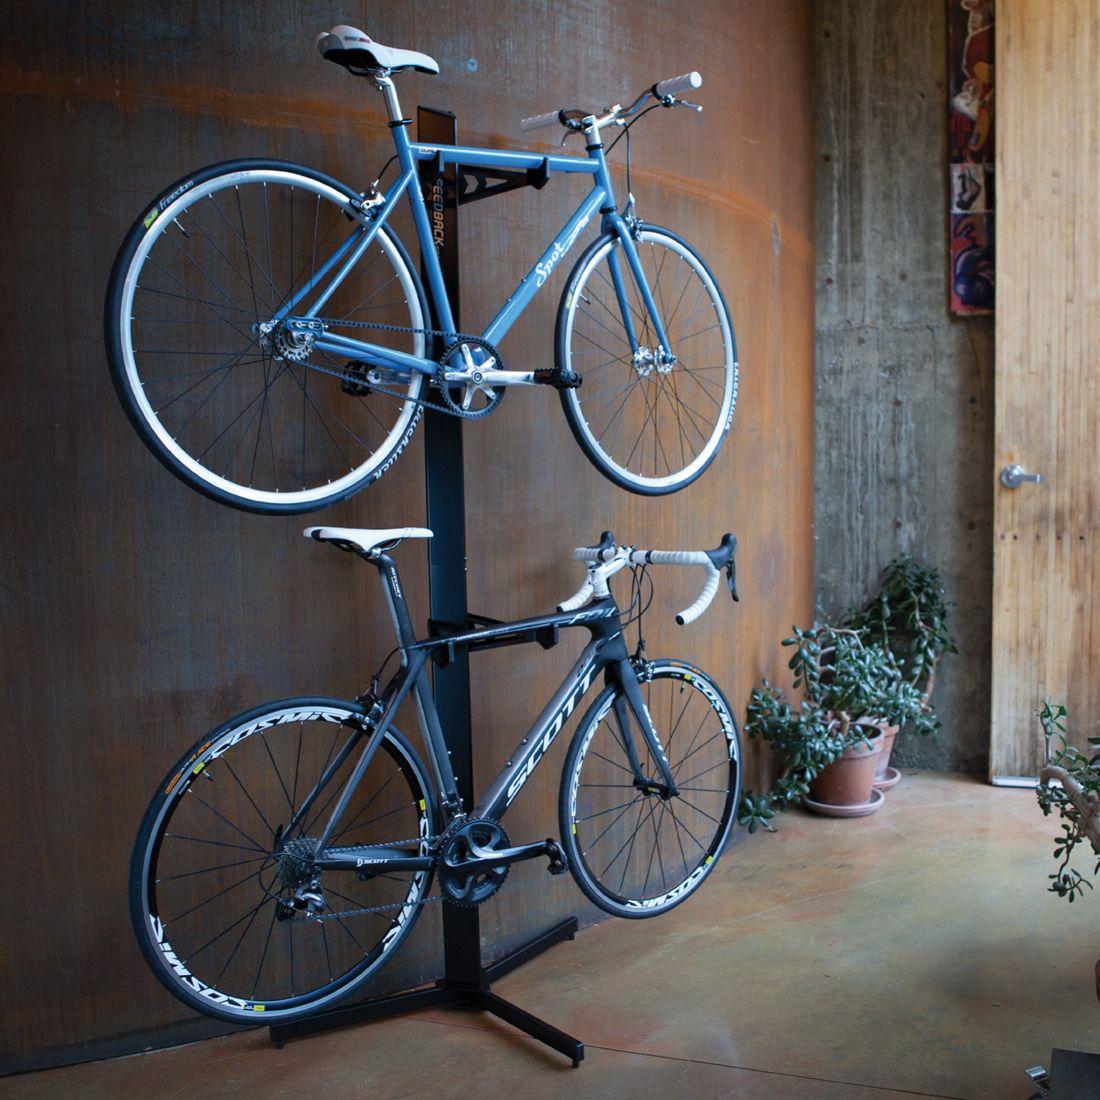 Superbe Metal Home Freestanding Rack To Store And Display Your Bikes. #bikestorage  #garagestorage #storeyourboard